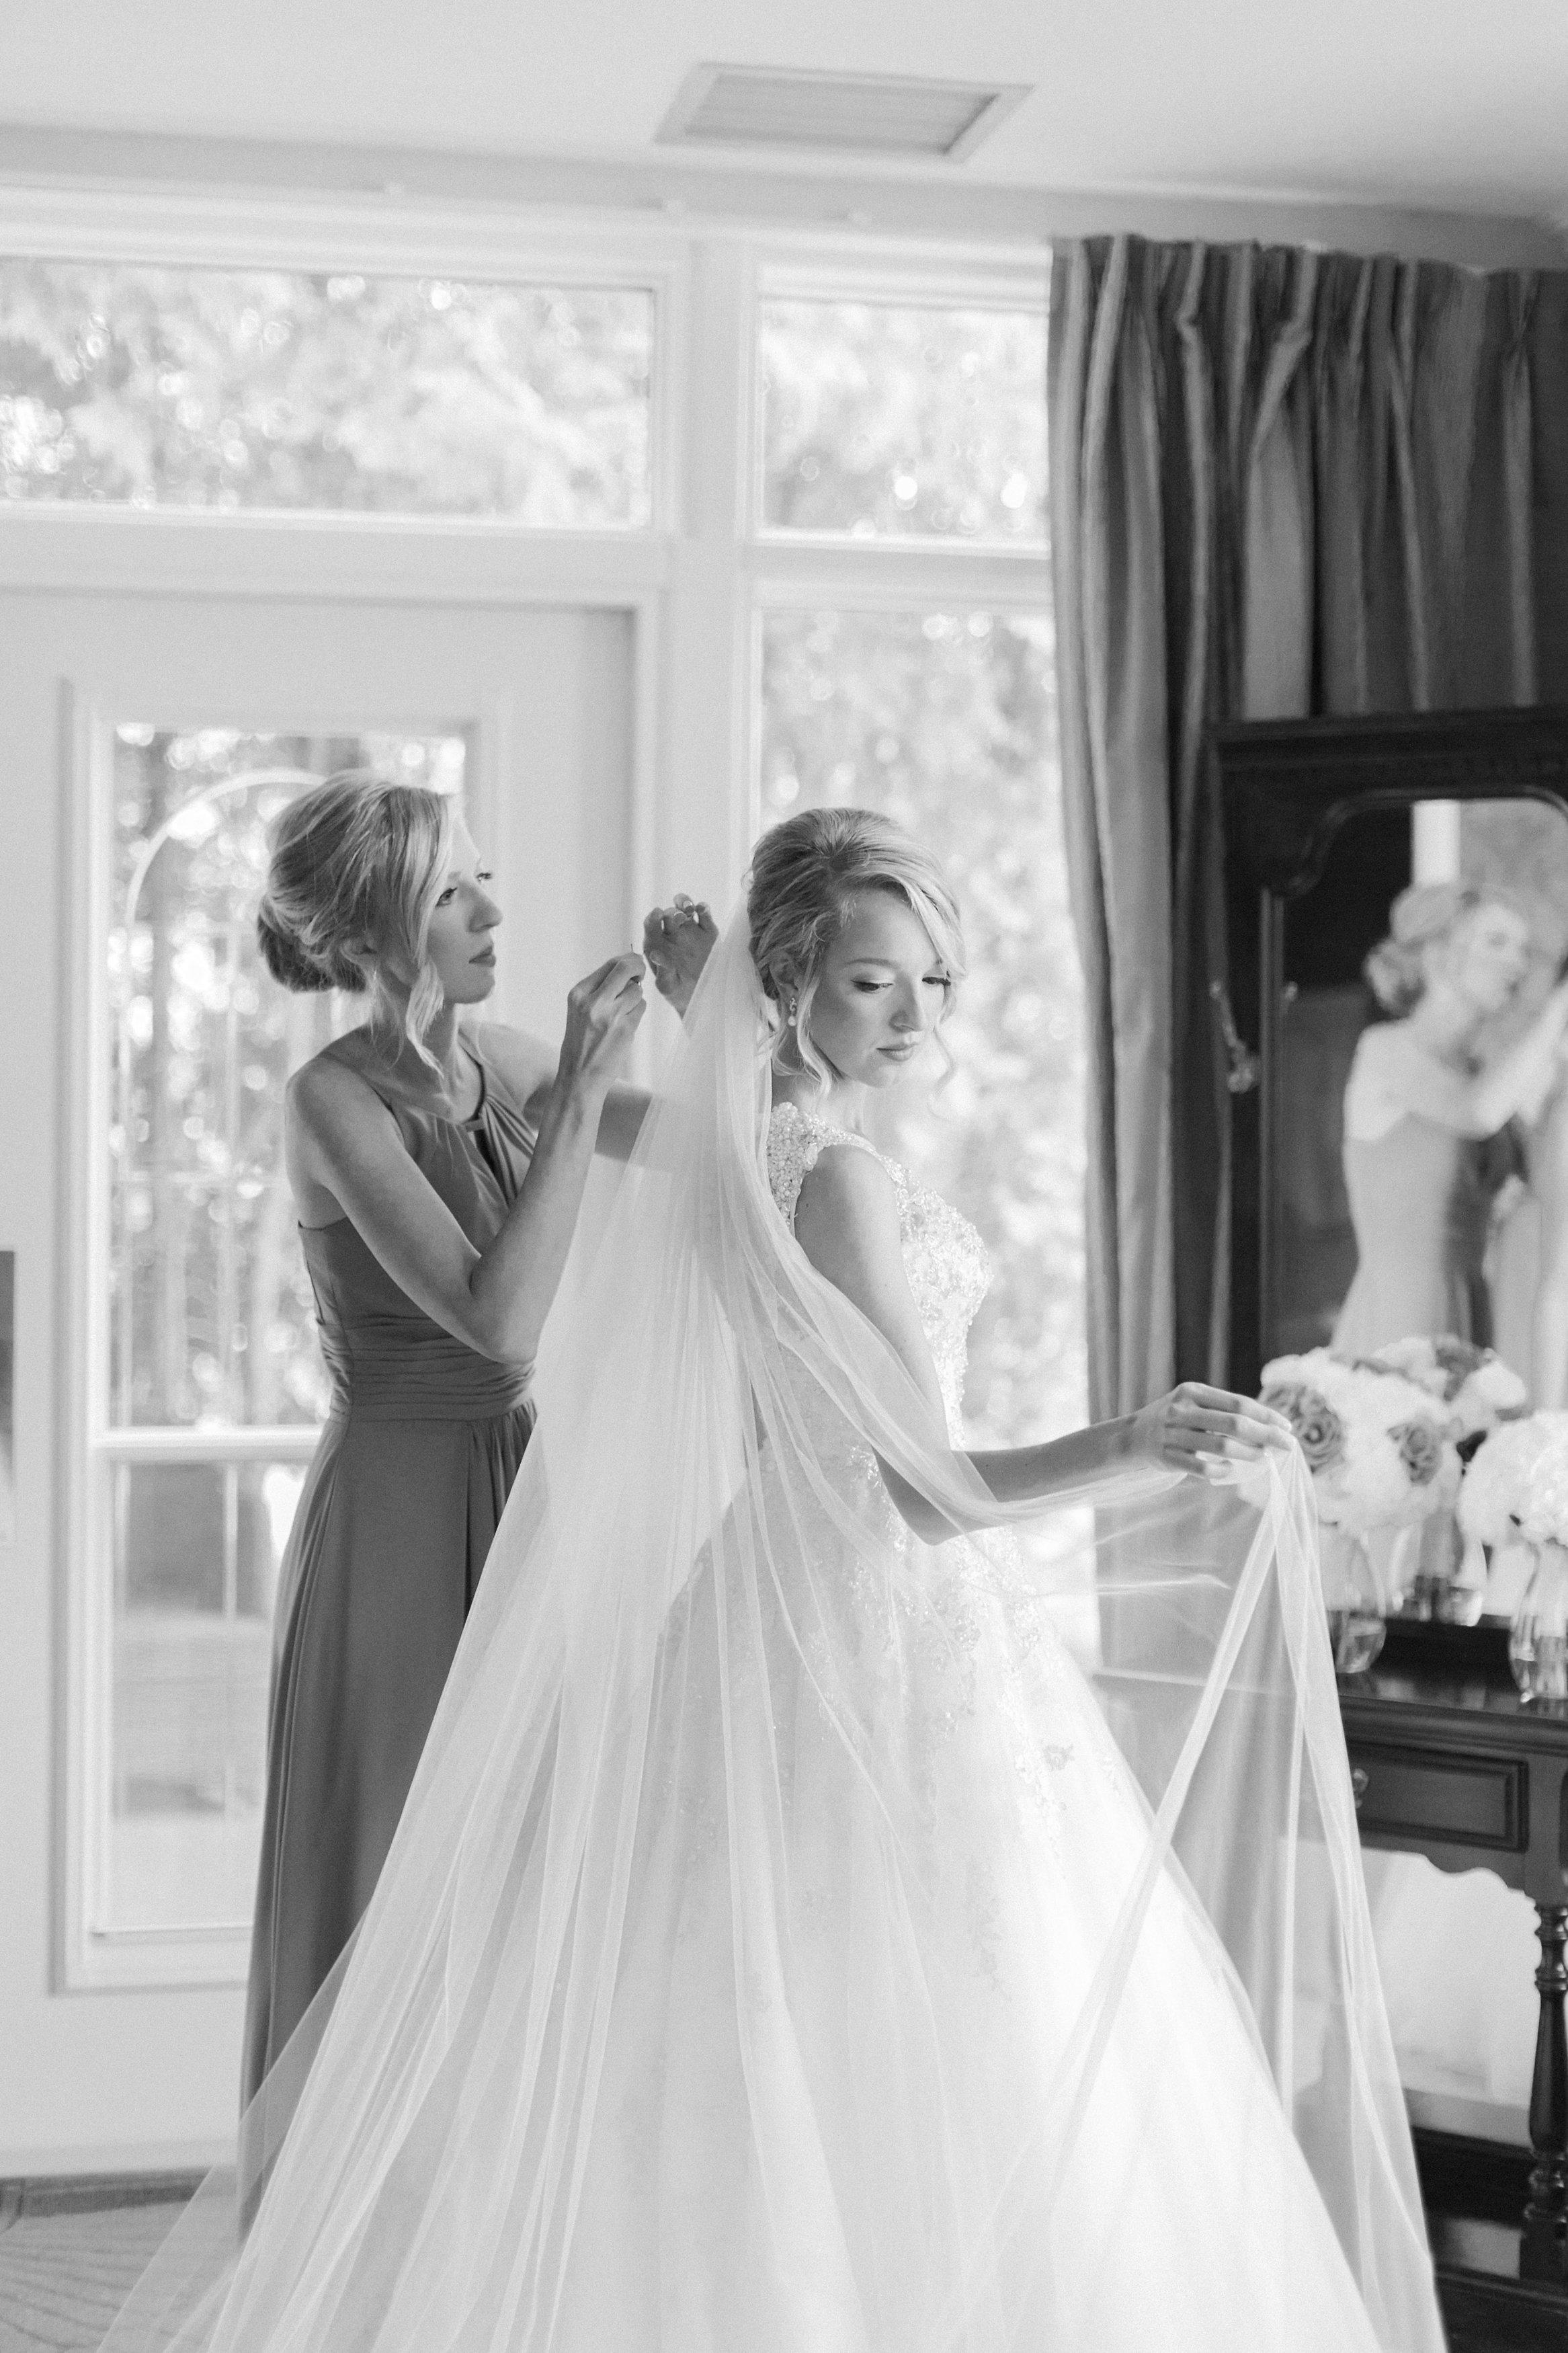 toronto-wedding-photographer-richelle-hunter-ruth-jonathan-144.jpg